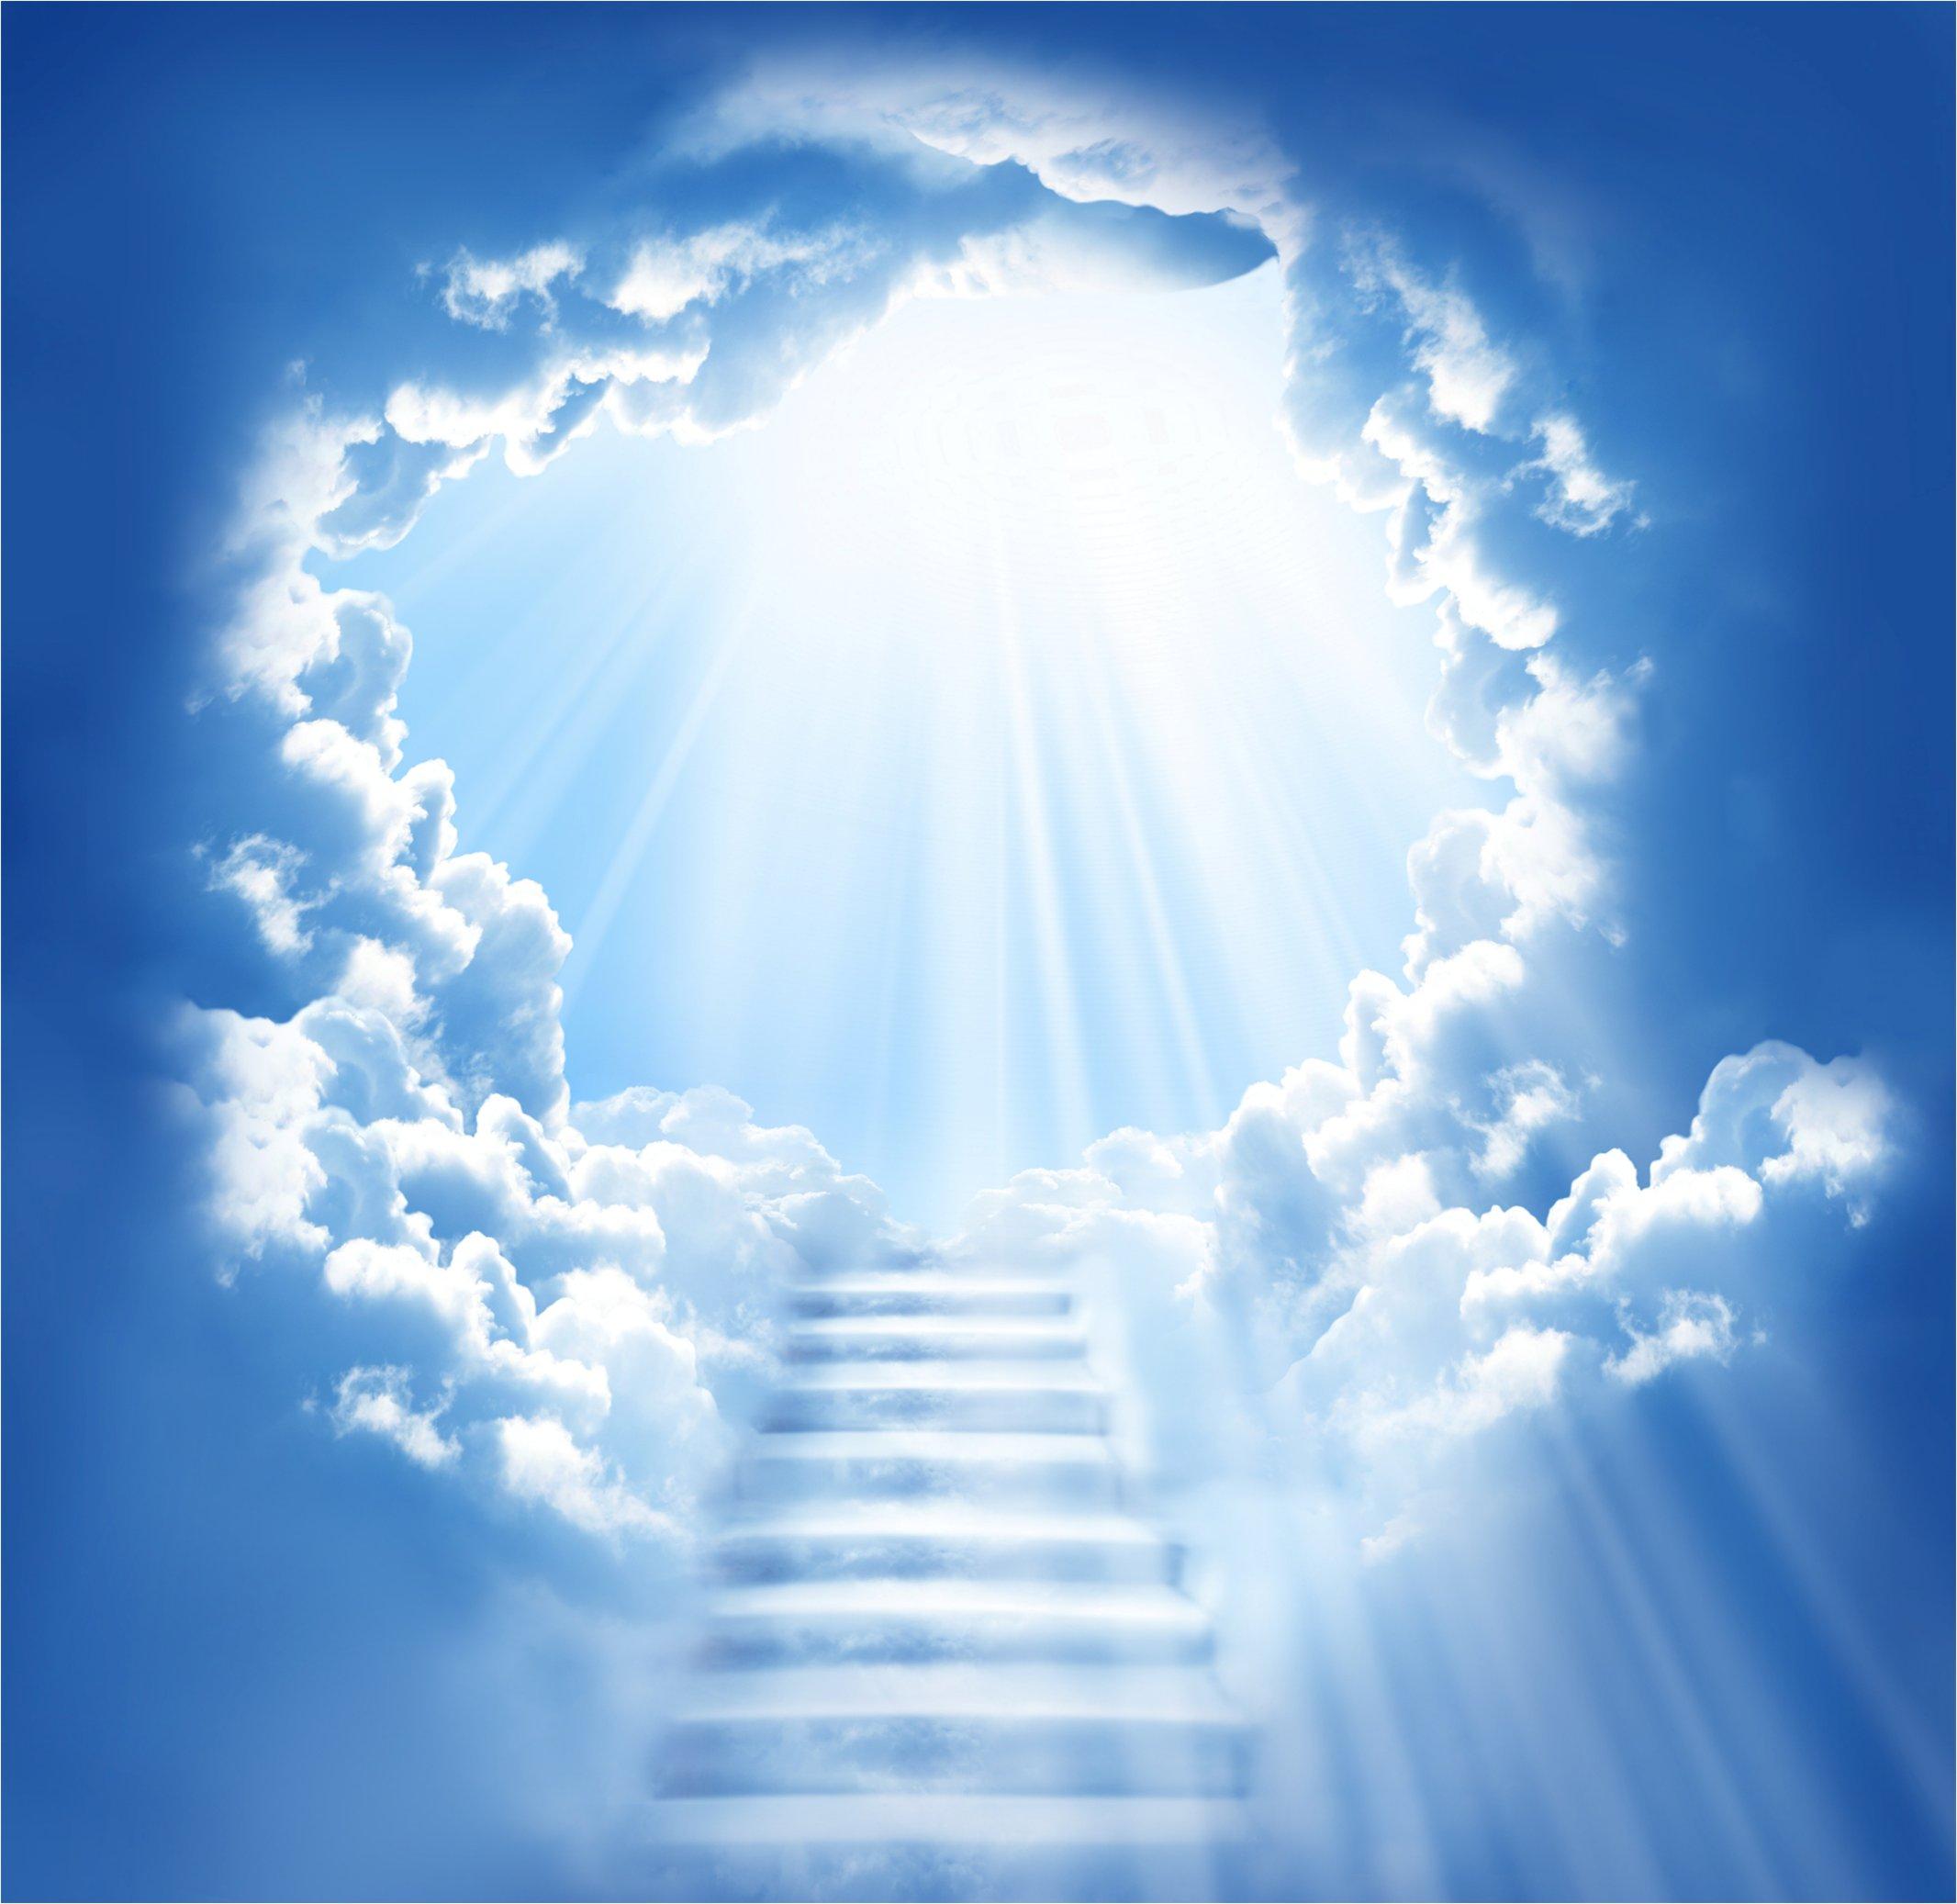 free christian clipart heaven - photo #44